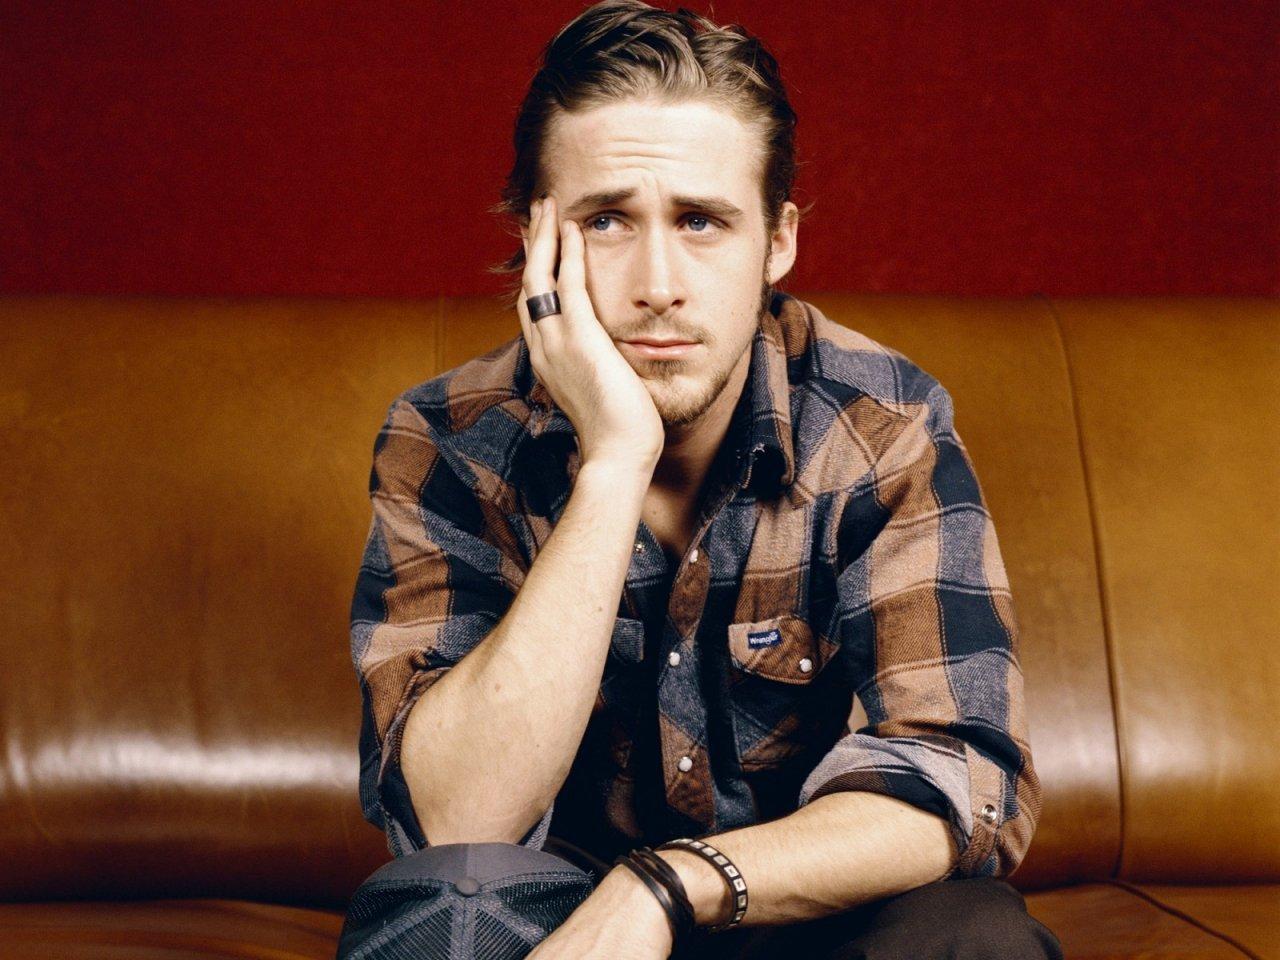 RYAN GOSLING Ryan-Gosling-ryan-gosling-22881860-1280-960